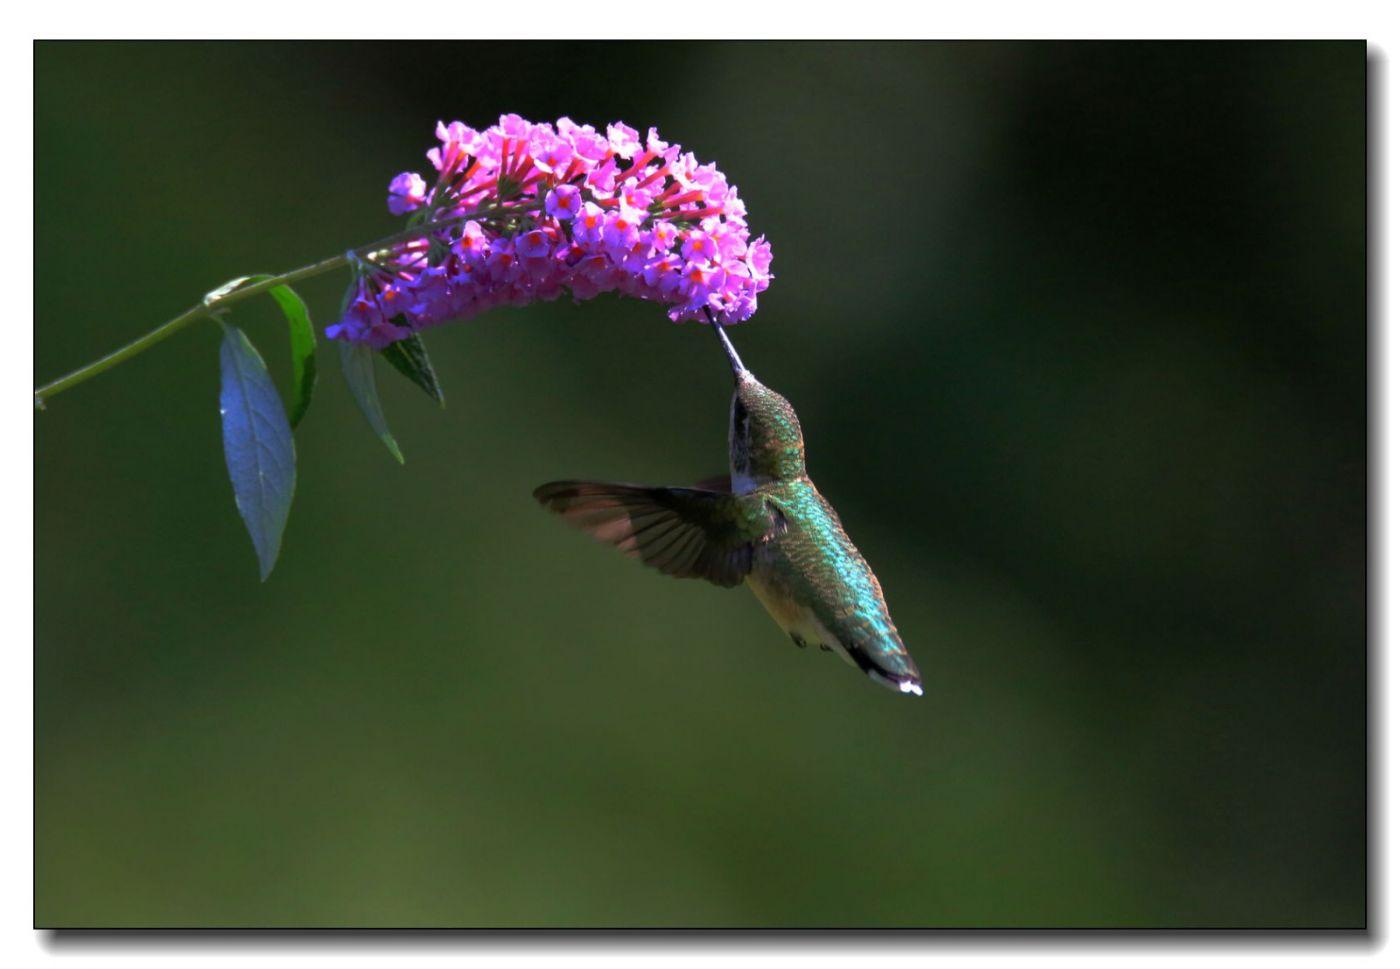 蜂鸟组图(五)_图1-3